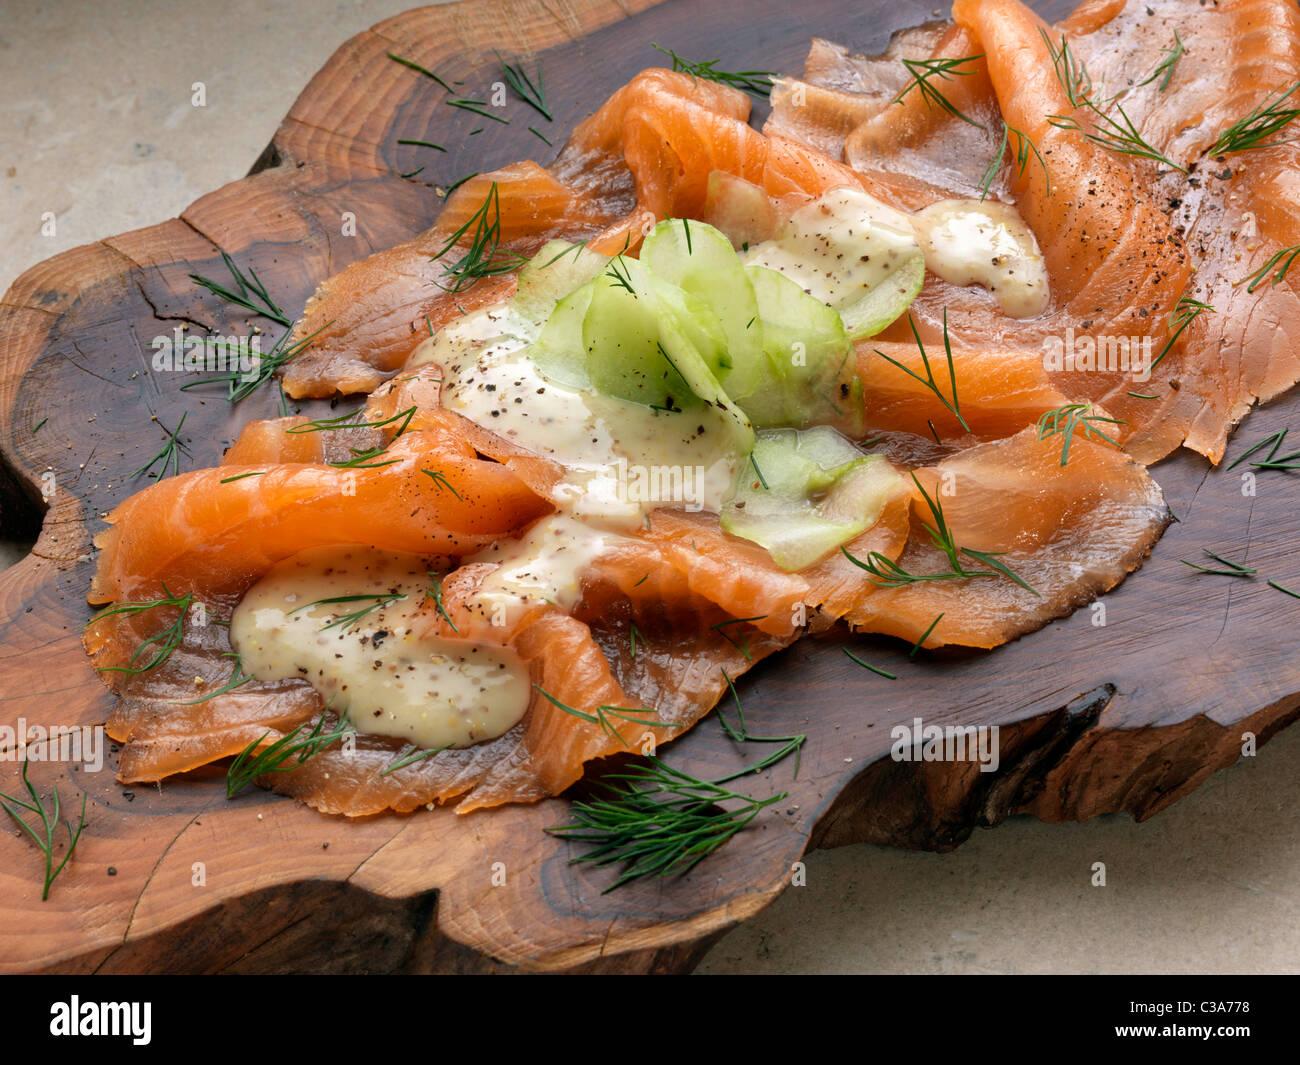 Gravadlax smoked salmon with dill cucumber mustard dressing Marco Pierre White recipe gravlax - Stock Image